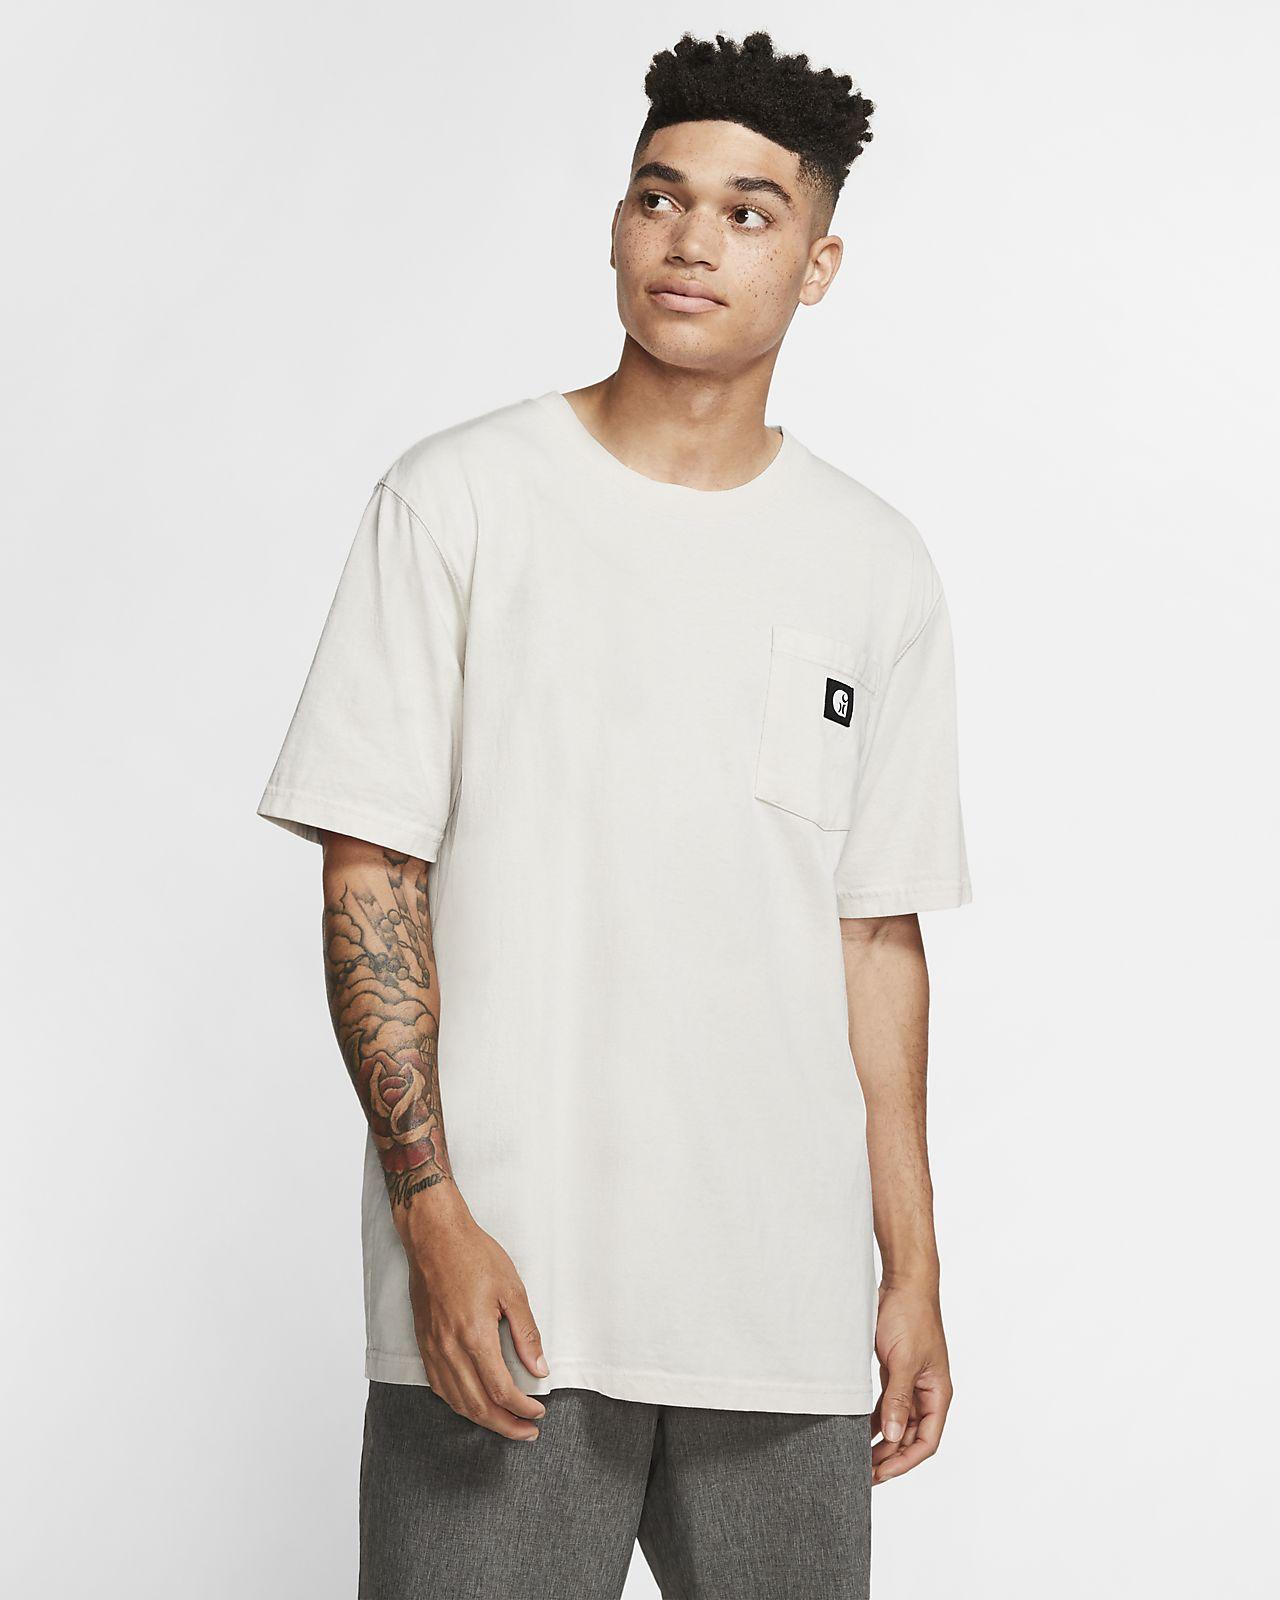 Tee-shirt Hurley x Carhartt pour Homme